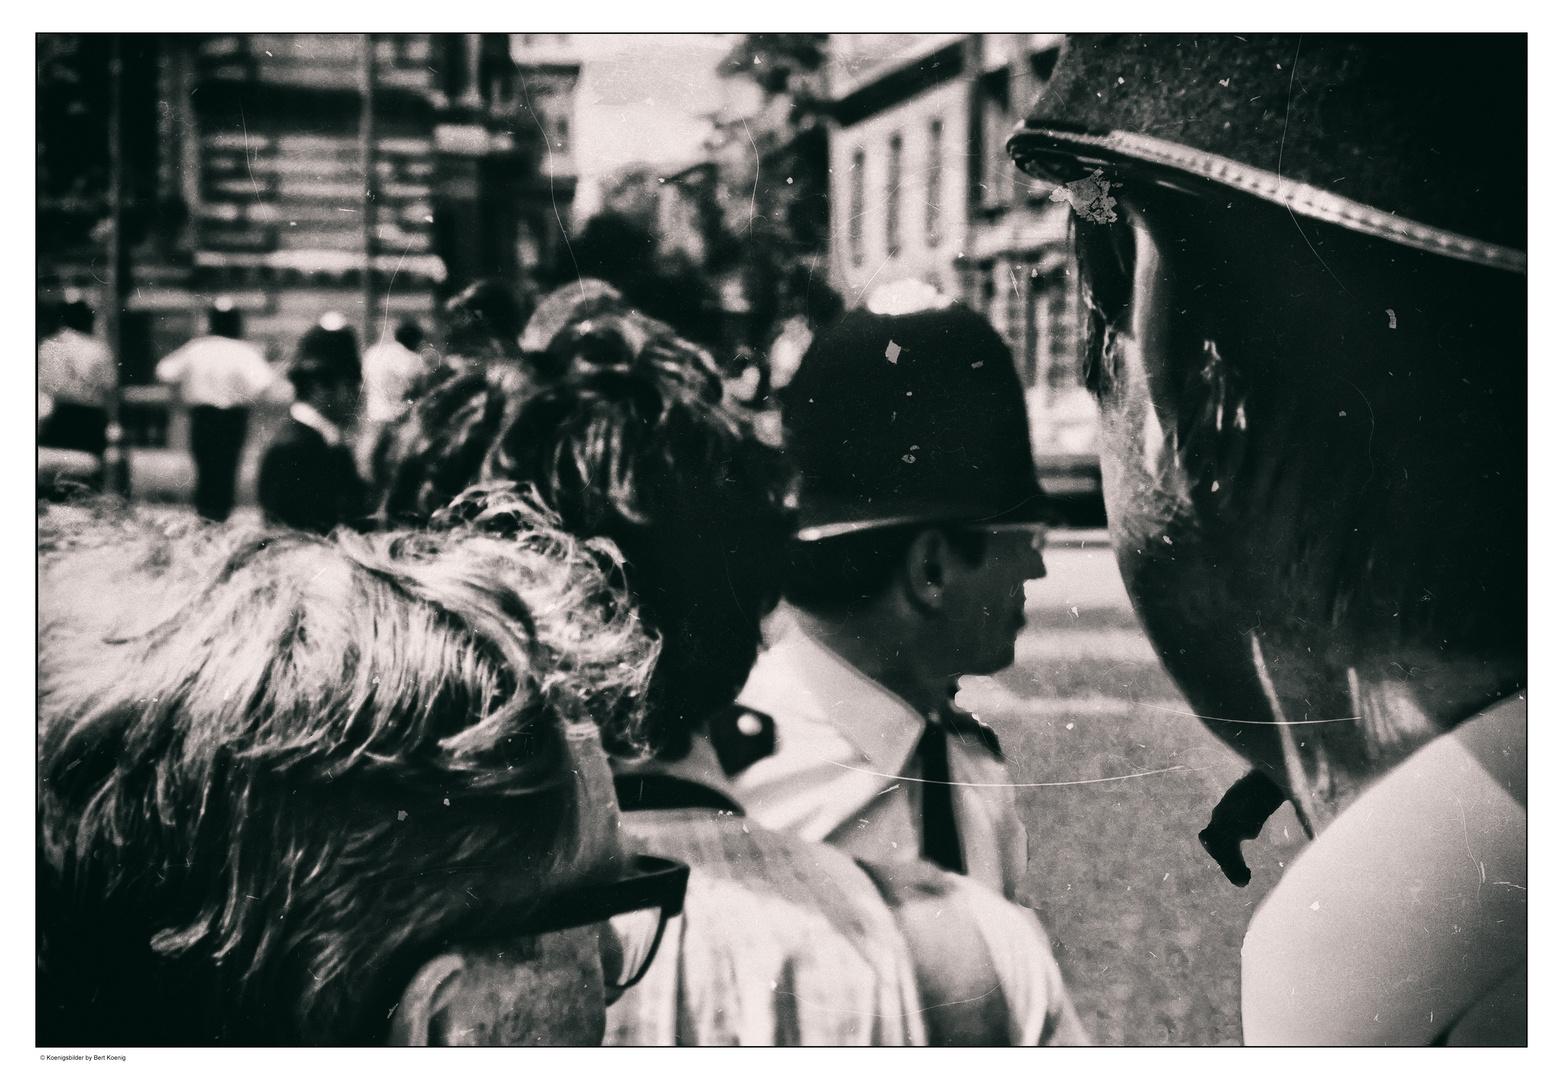 London 1982 - Heute ist Staatsbesuch